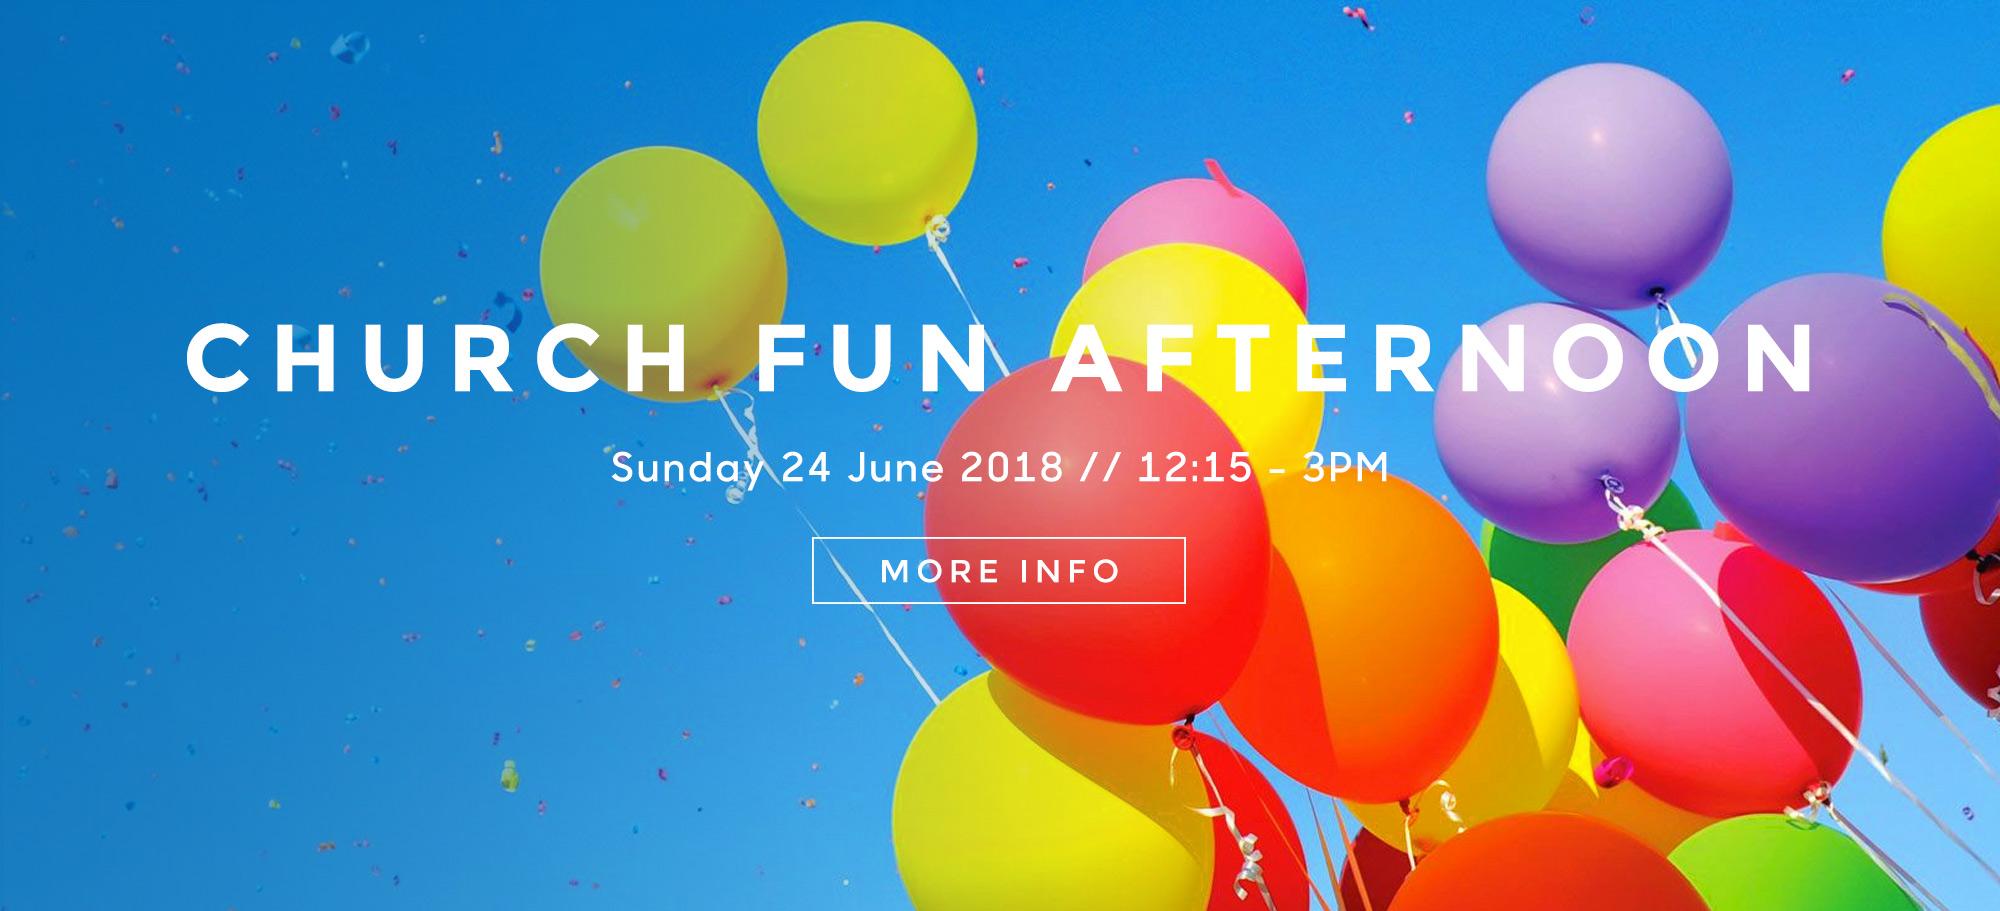 Church-fun-afternoon